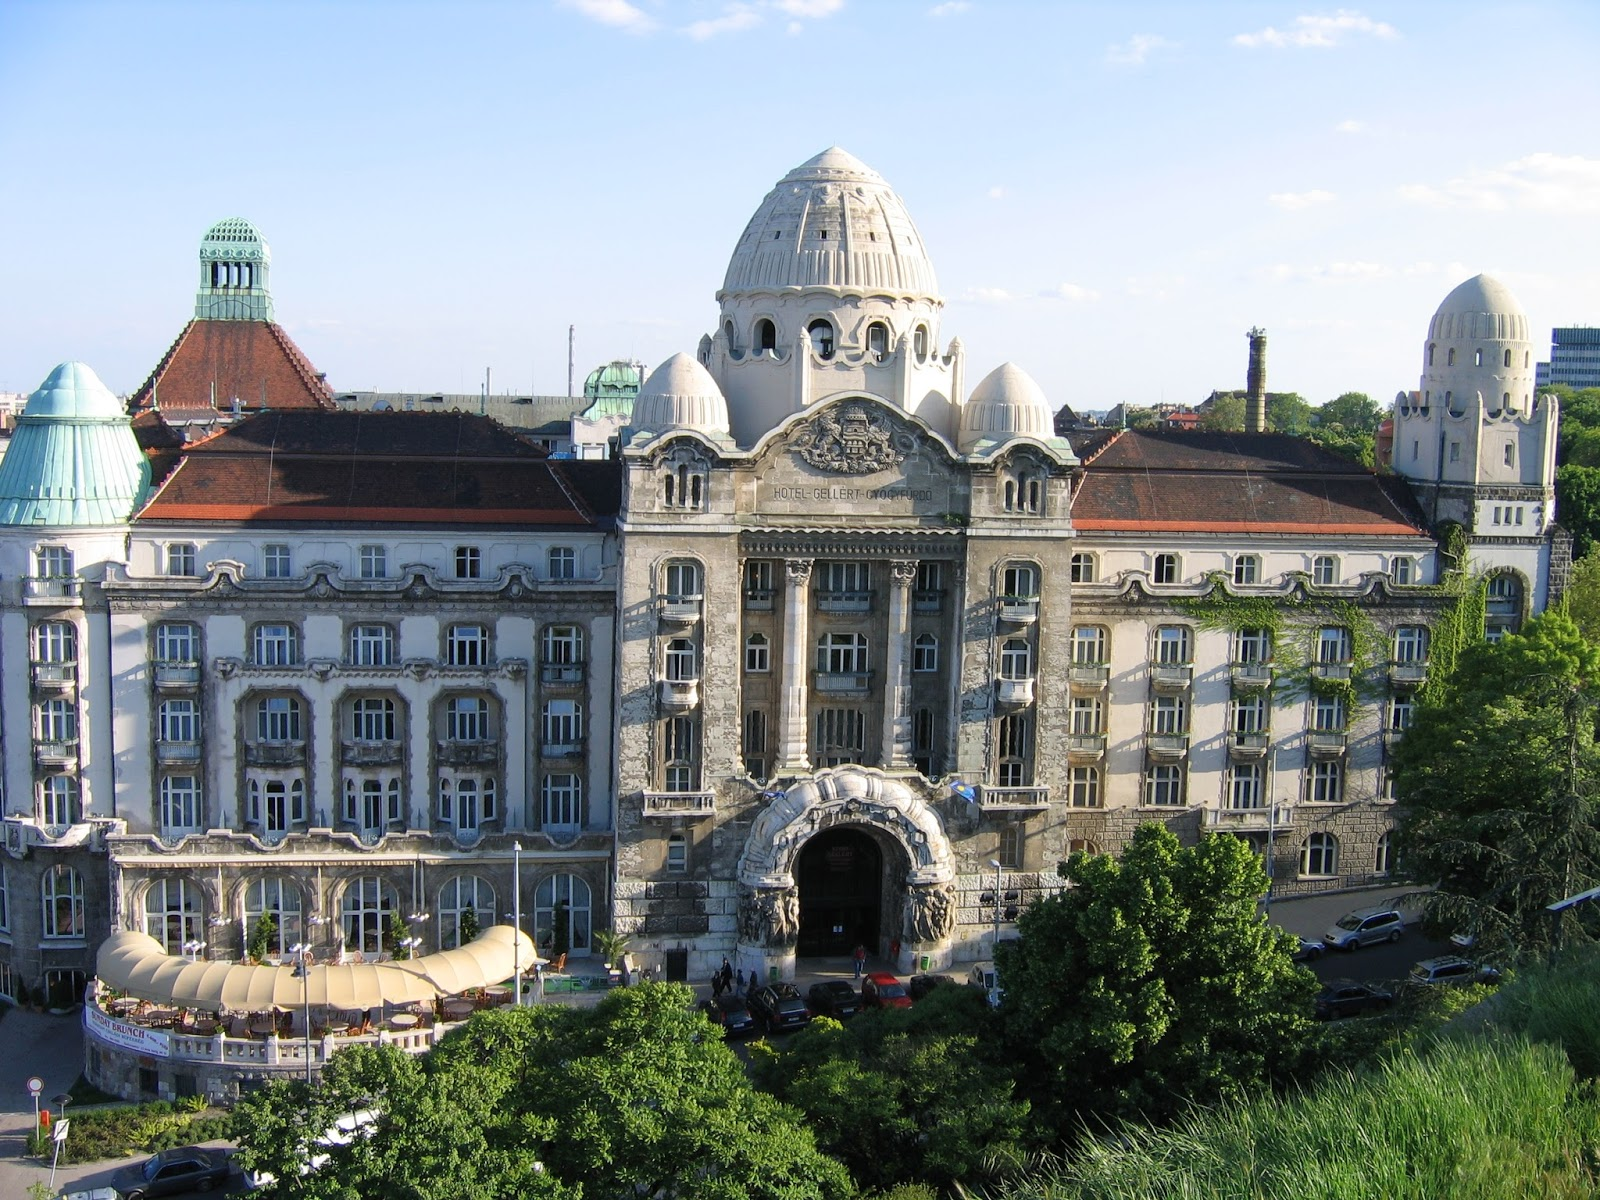 IMG_0299_-_Hungary,_Buda_-_Hotel_Gellért.JPG